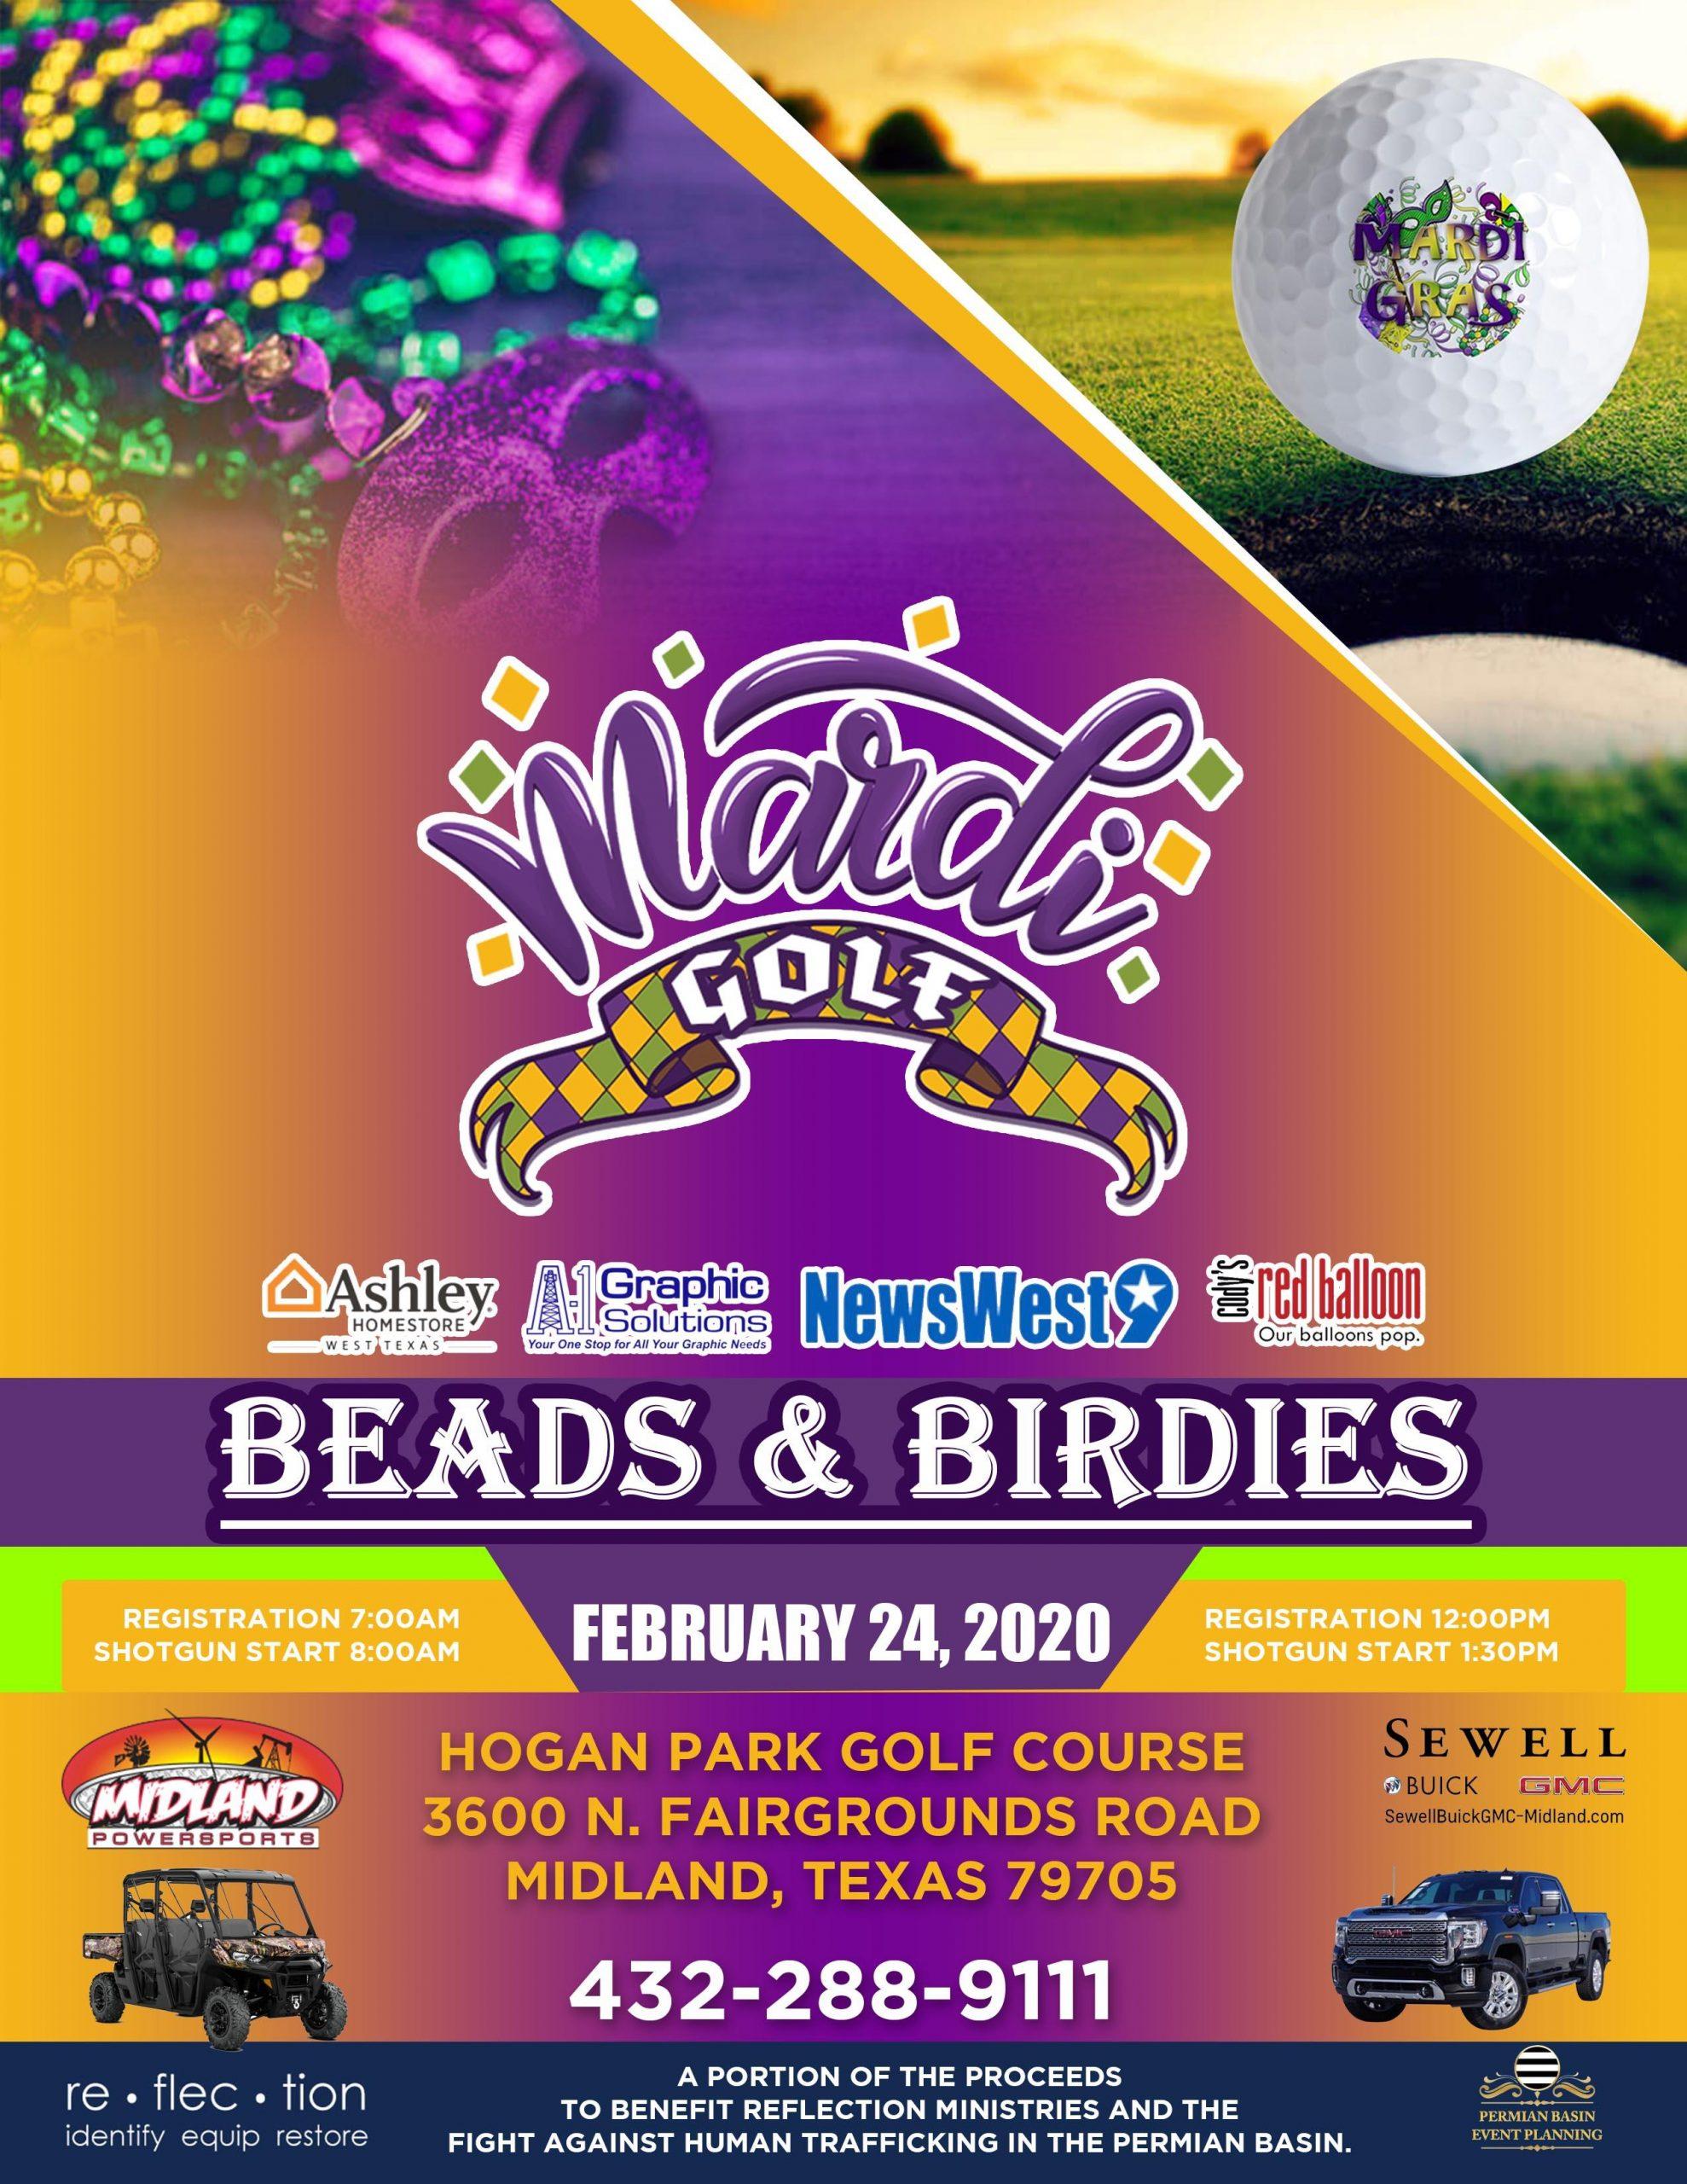 Mardi Golf-Beads & Birdies